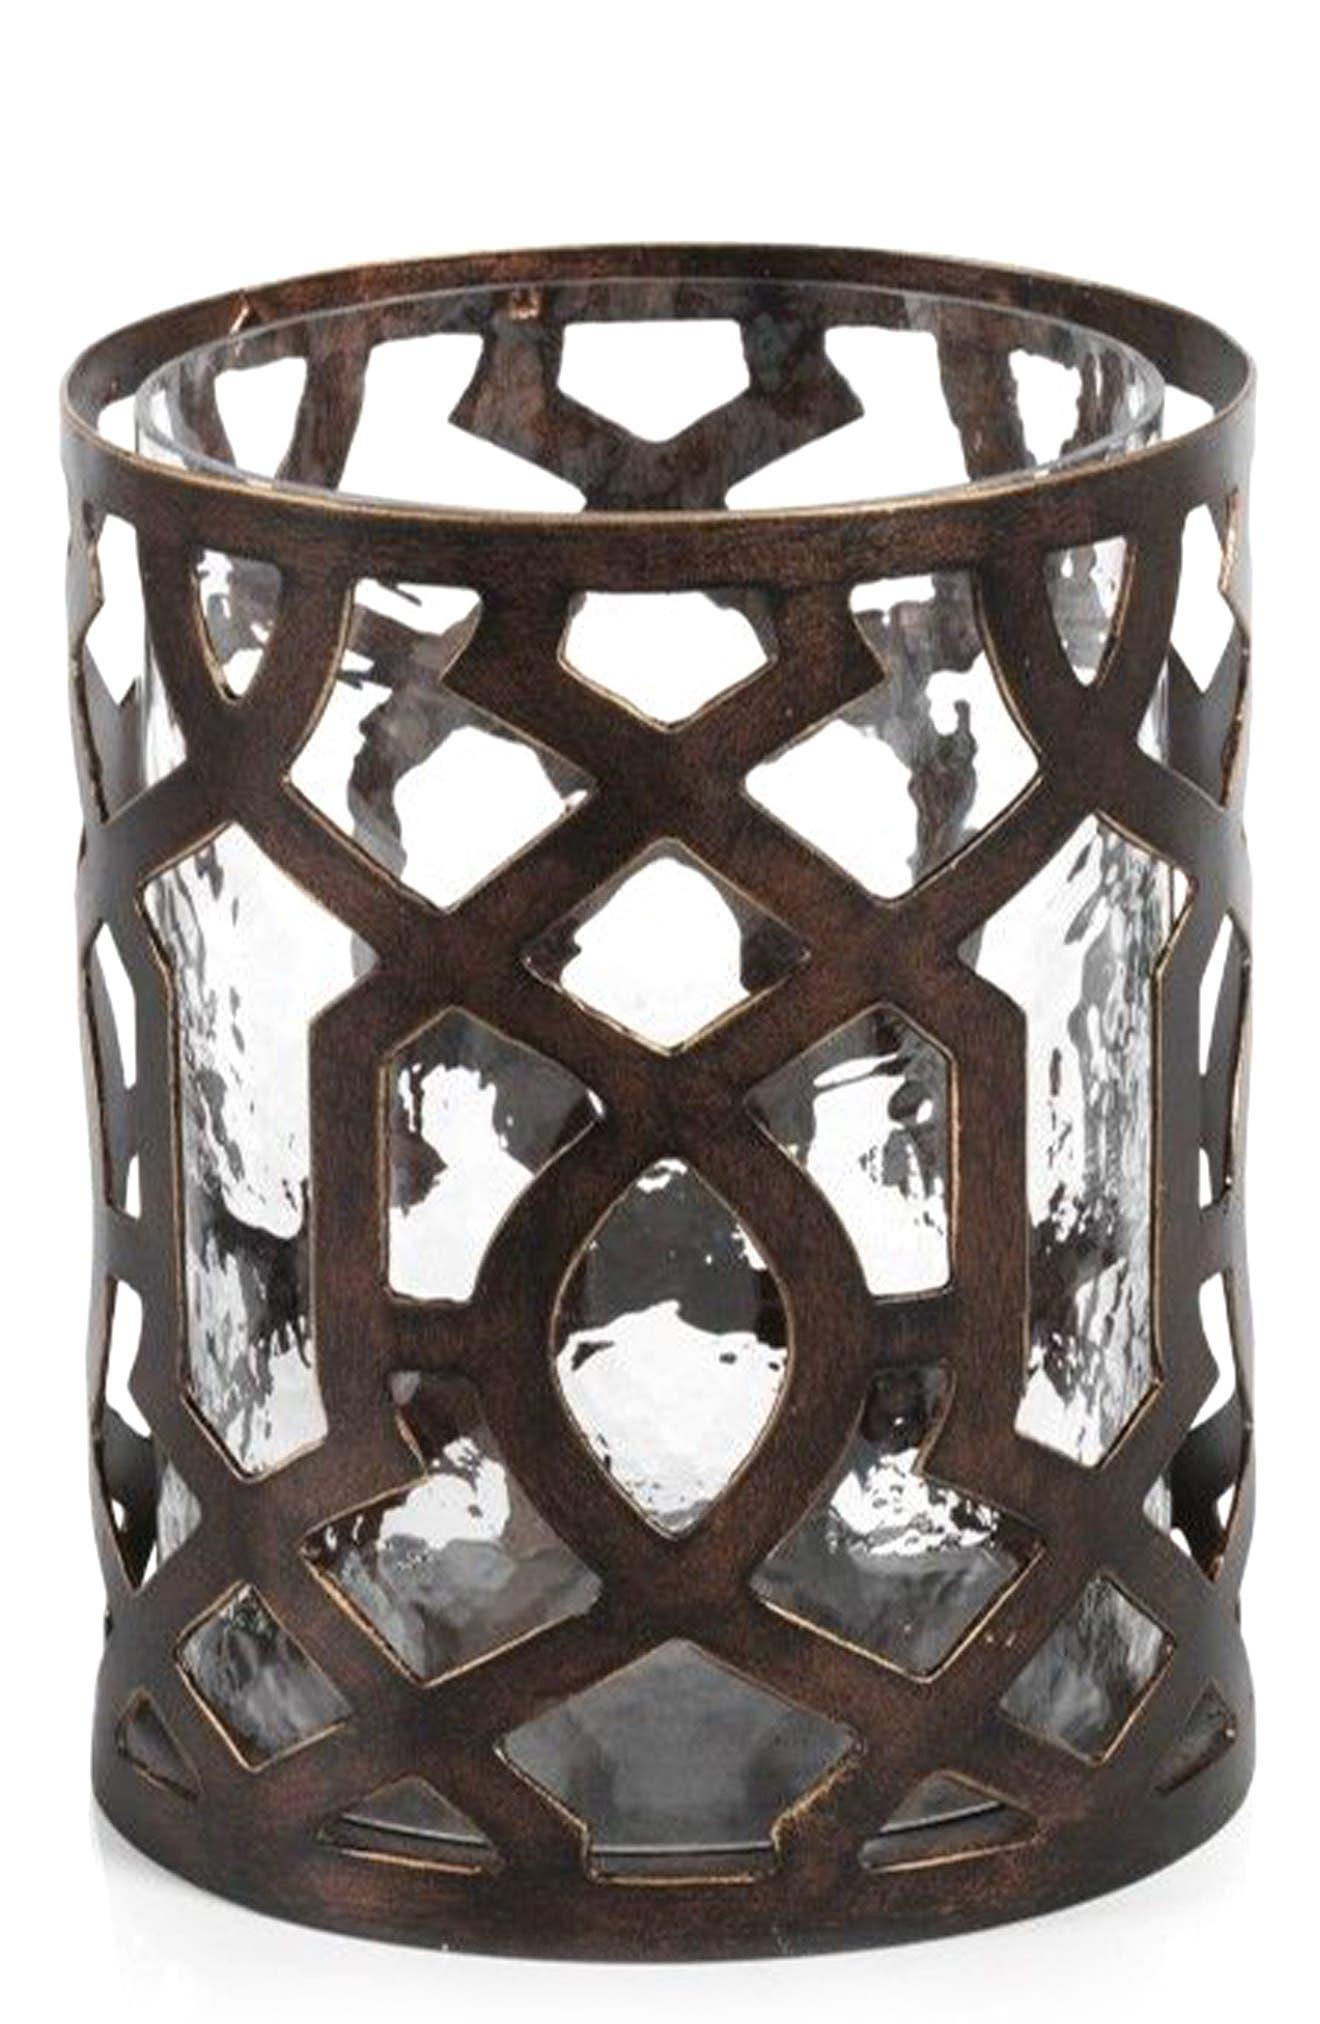 Small Trocadero Hurricane Candle Holder,                             Main thumbnail 1, color,                             Metallic/ Silver/ Grey